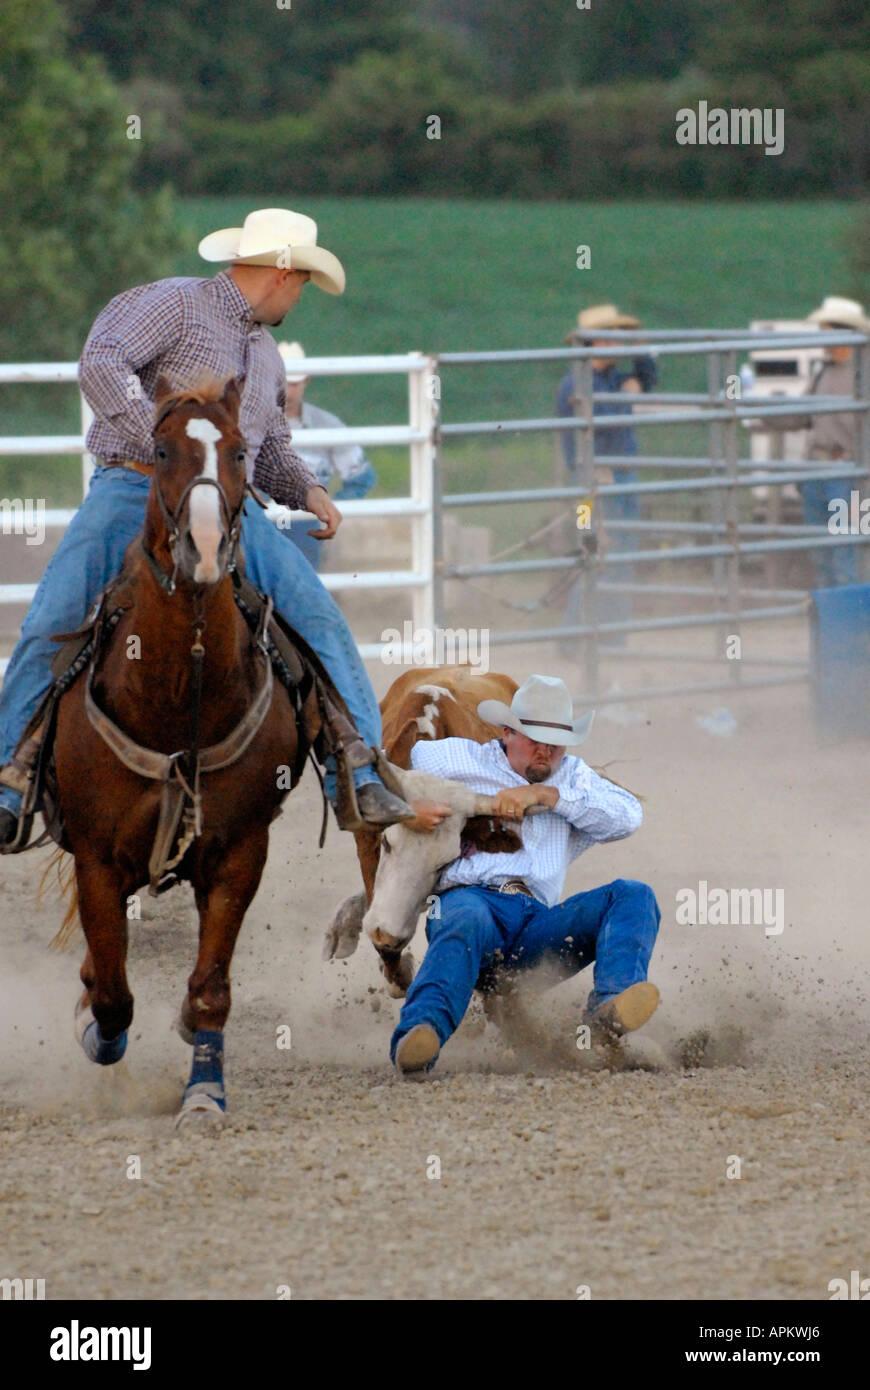 Cowboys teilnehmen im Rodeo Bull Doggy Style event Stockbild